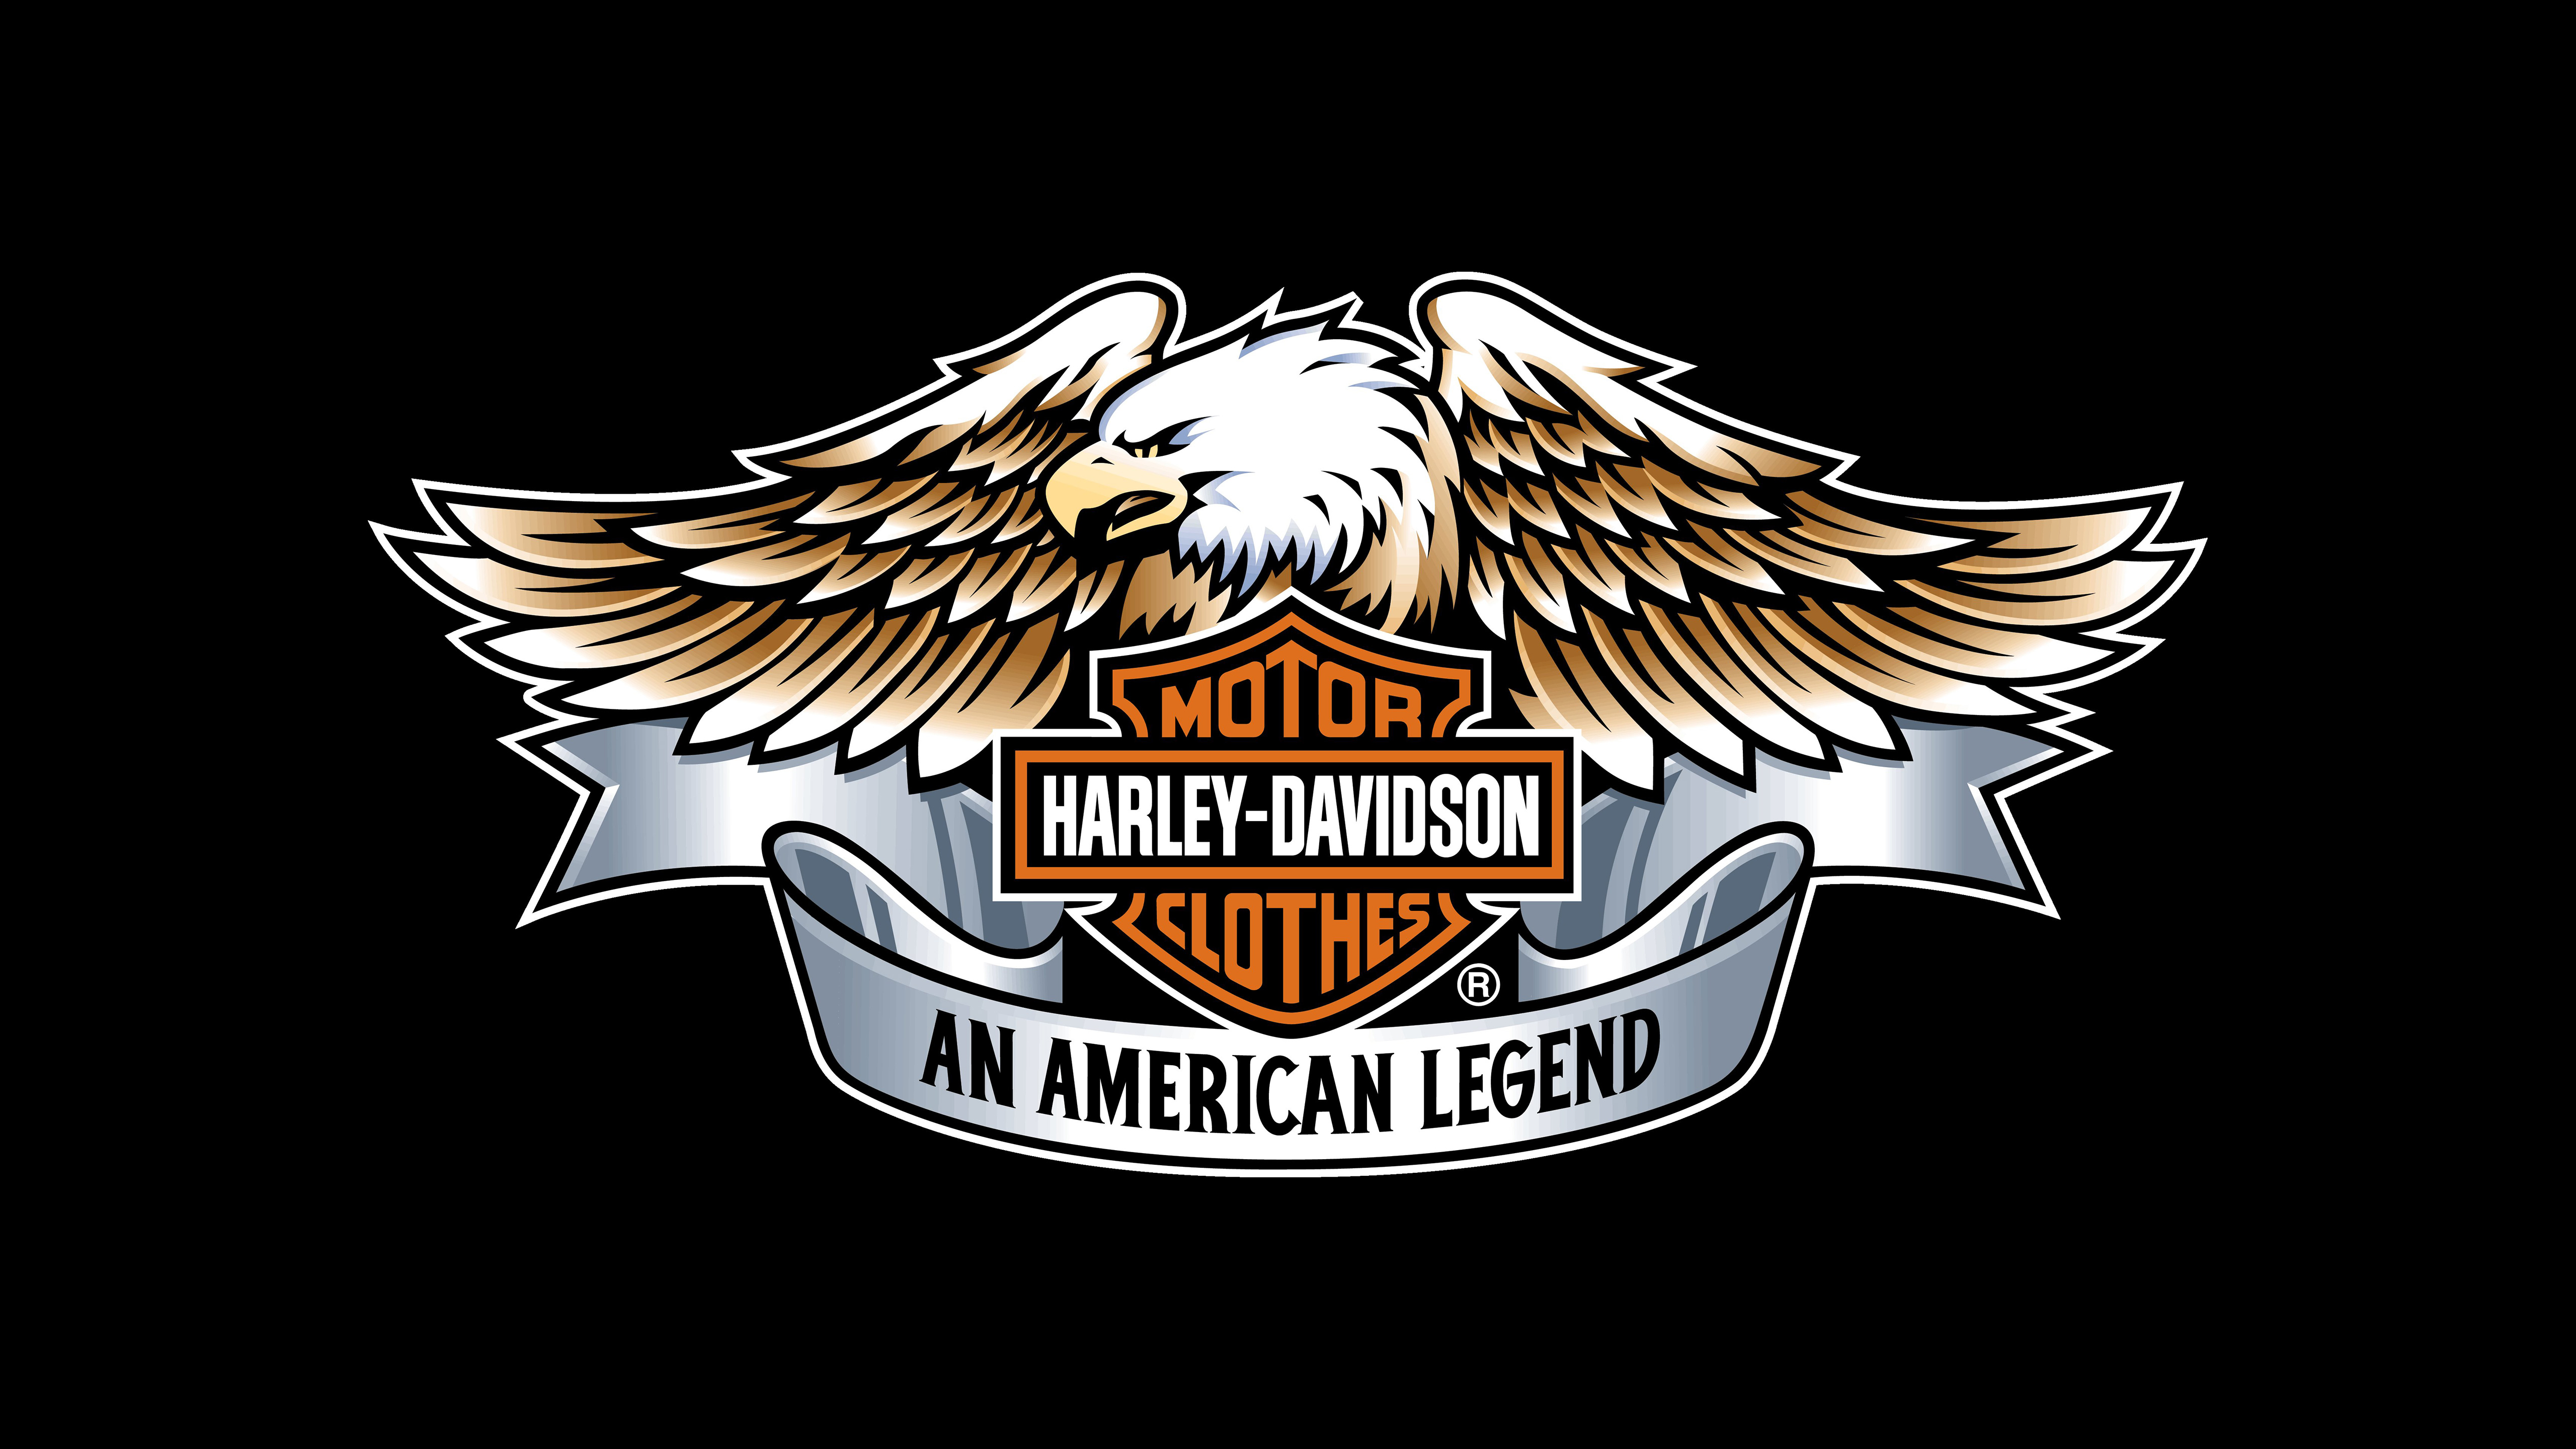 Harley davidson eagle logo 4k hd bikes 4k wallpapers images harley davidson eagle logo 4k voltagebd Gallery